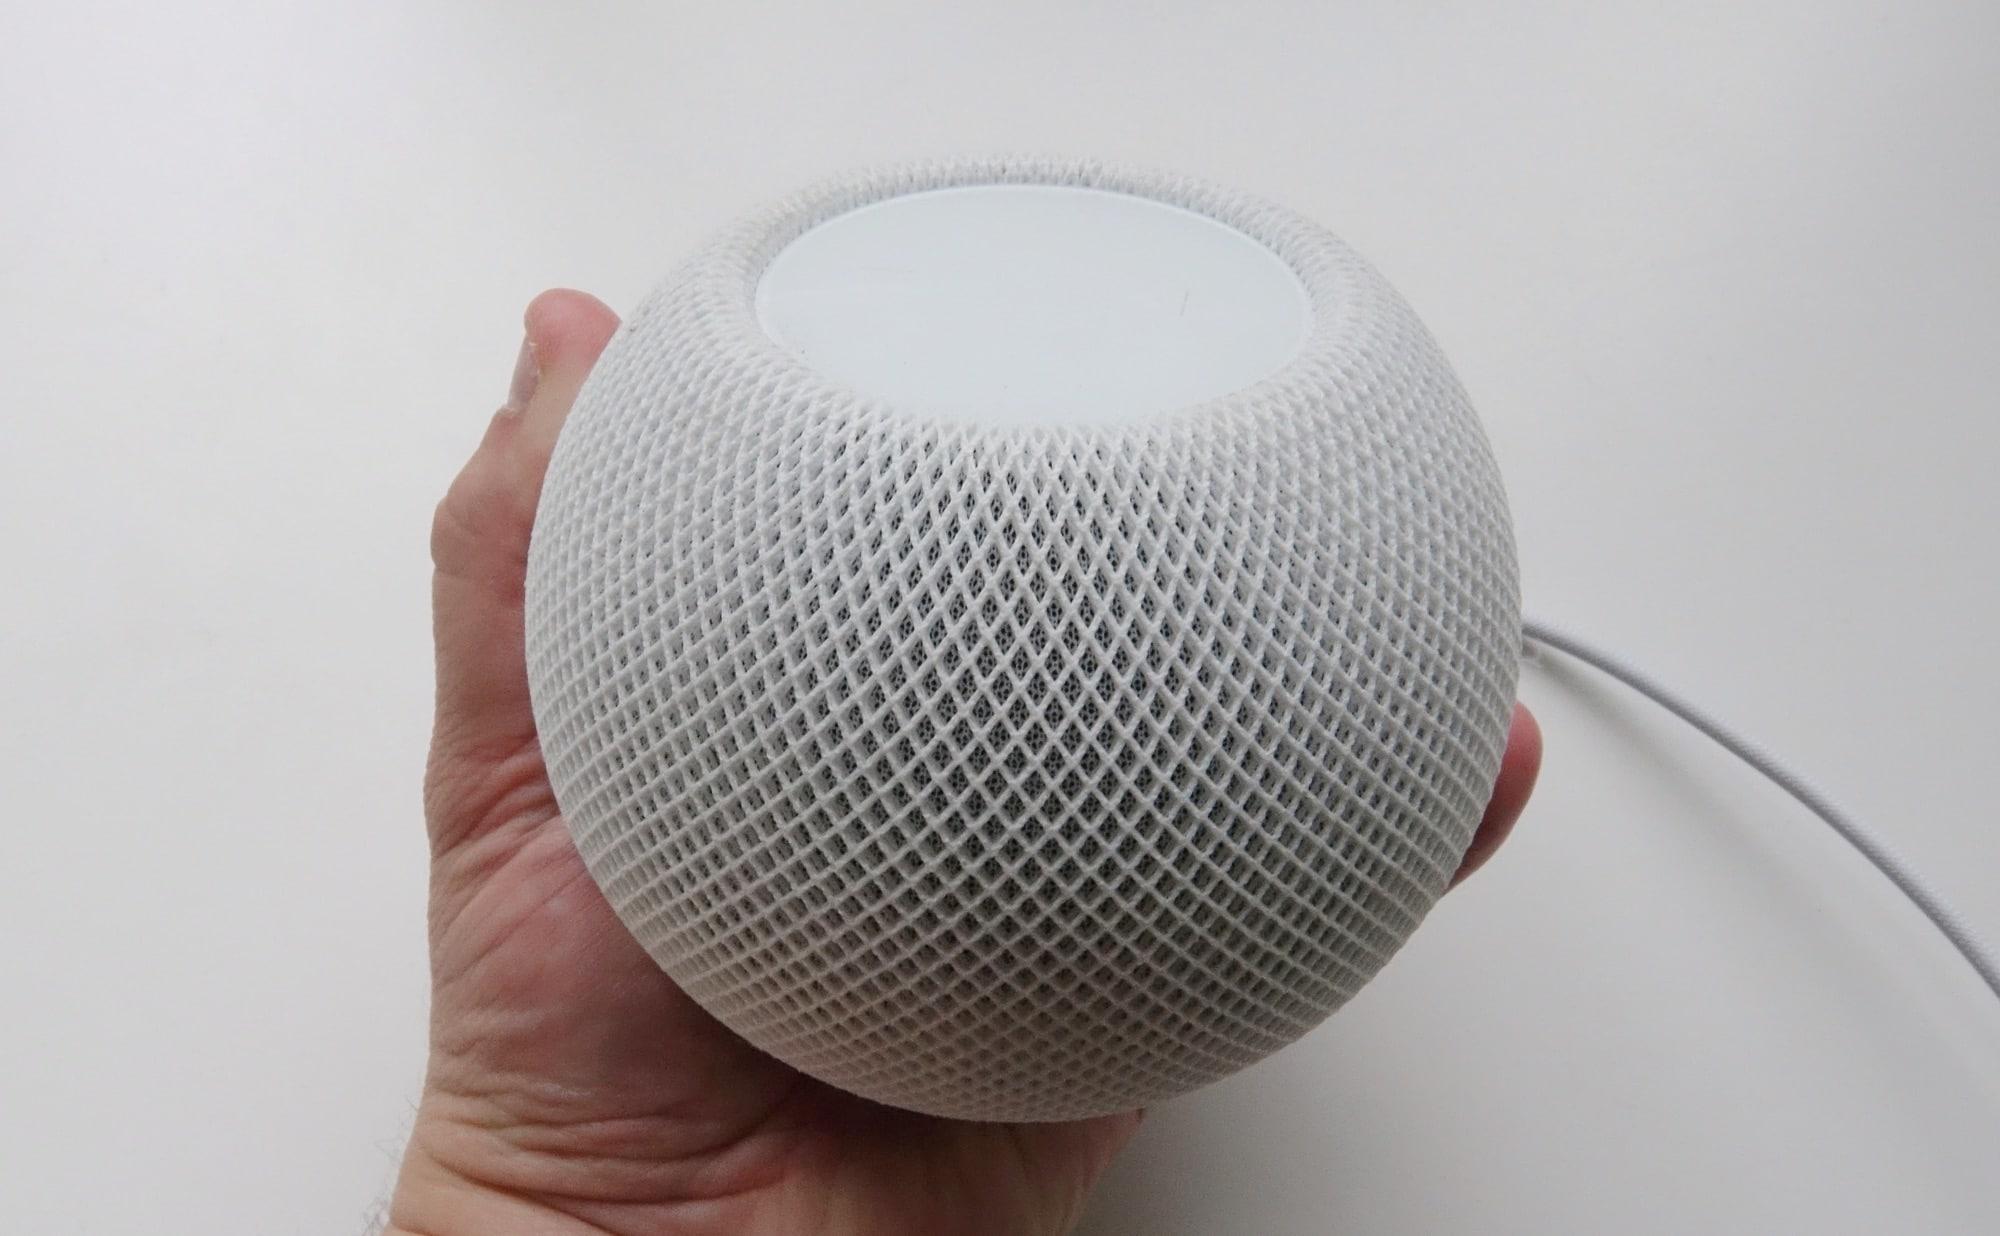 Apple HomePod Mini reviewed